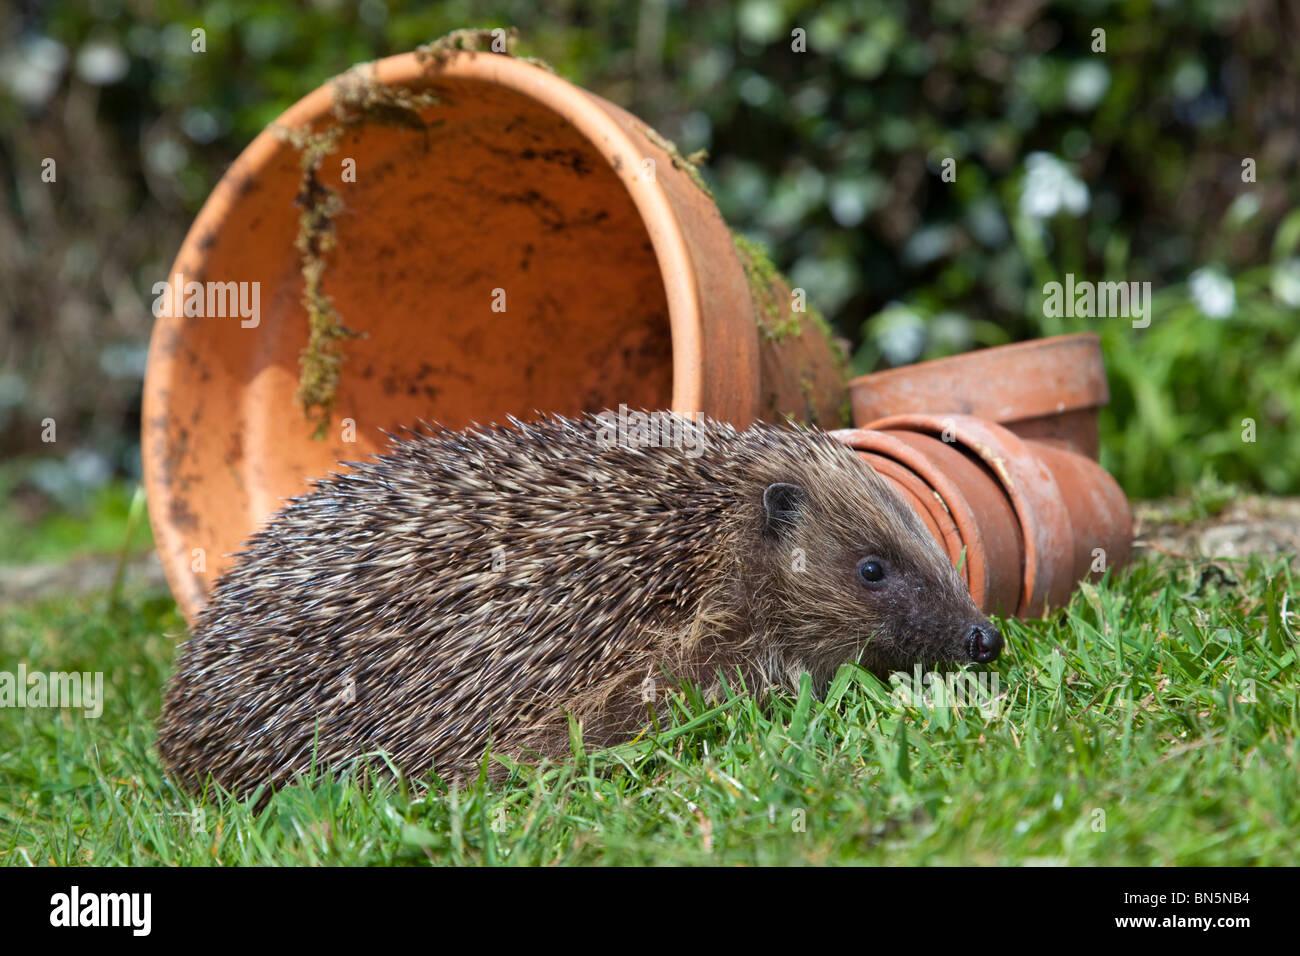 Hedgehog; Erinaceus europaeus; with a plant pot; garden - Stock Image